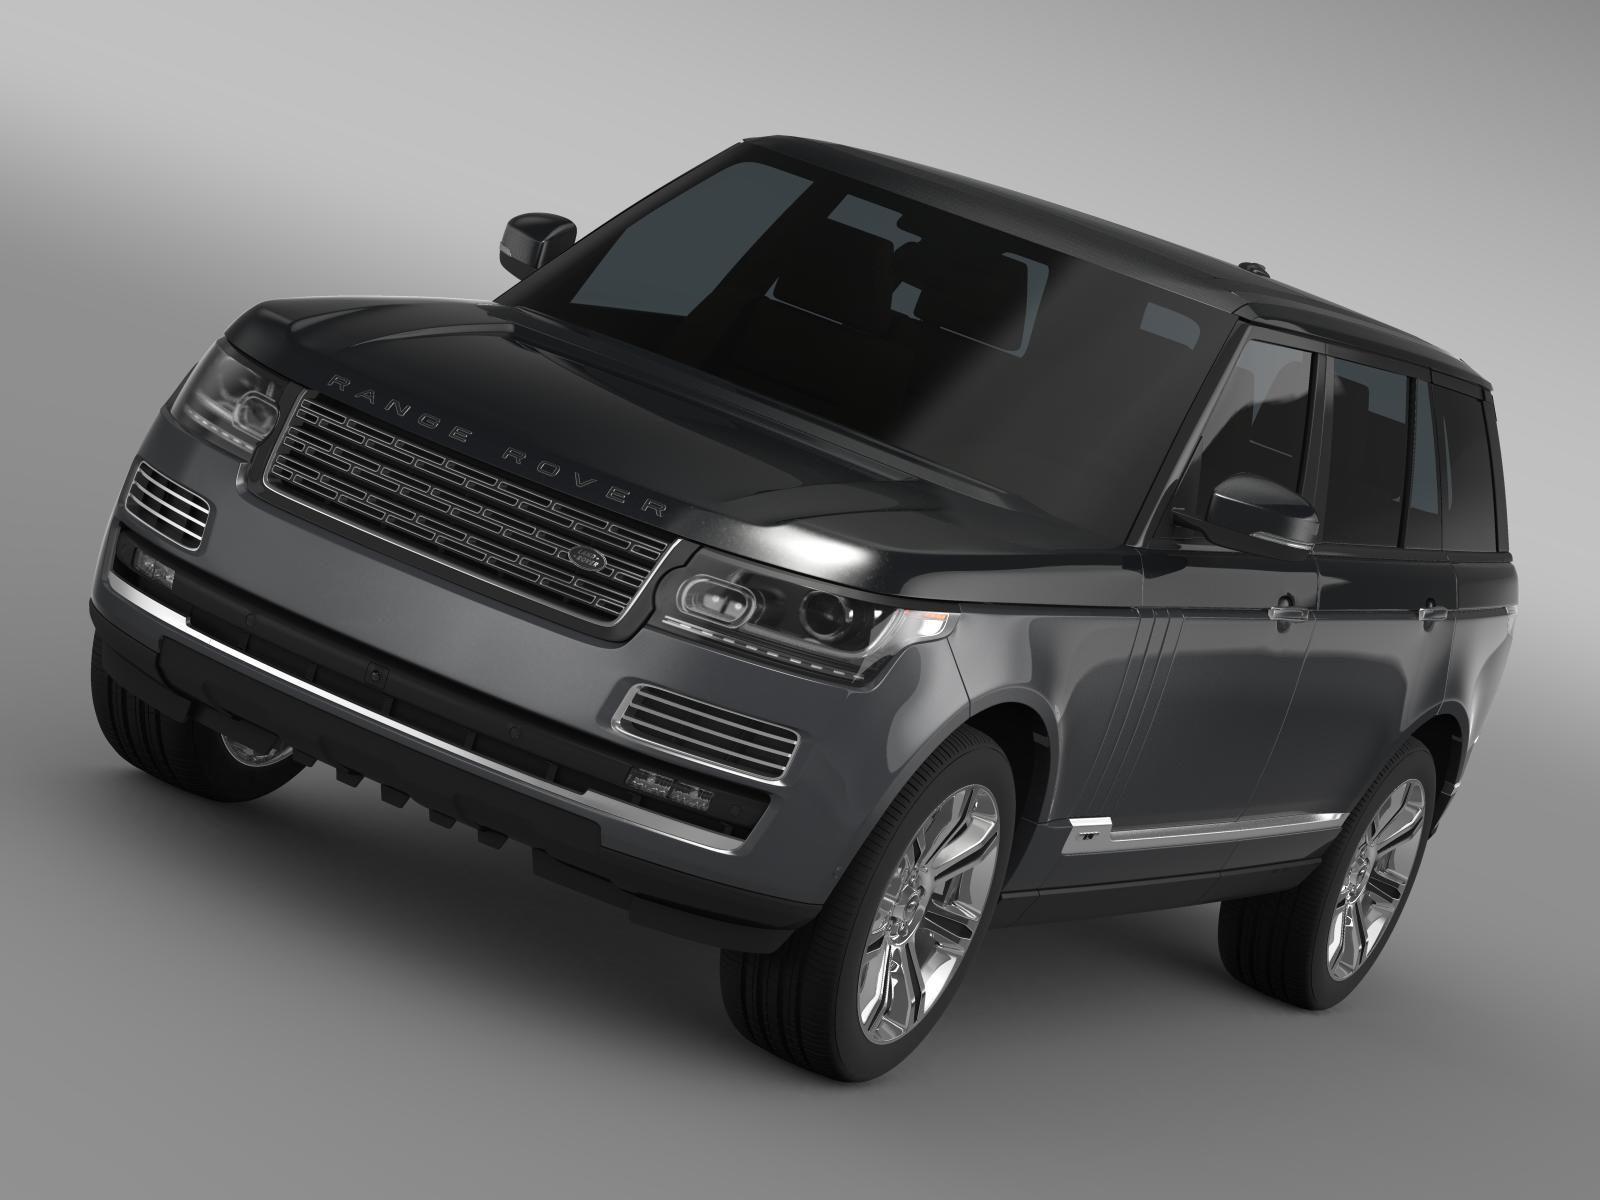 Range Rover Svautobiography L405 2016 Range Rover Volkswagen Touareg Suv Comparison